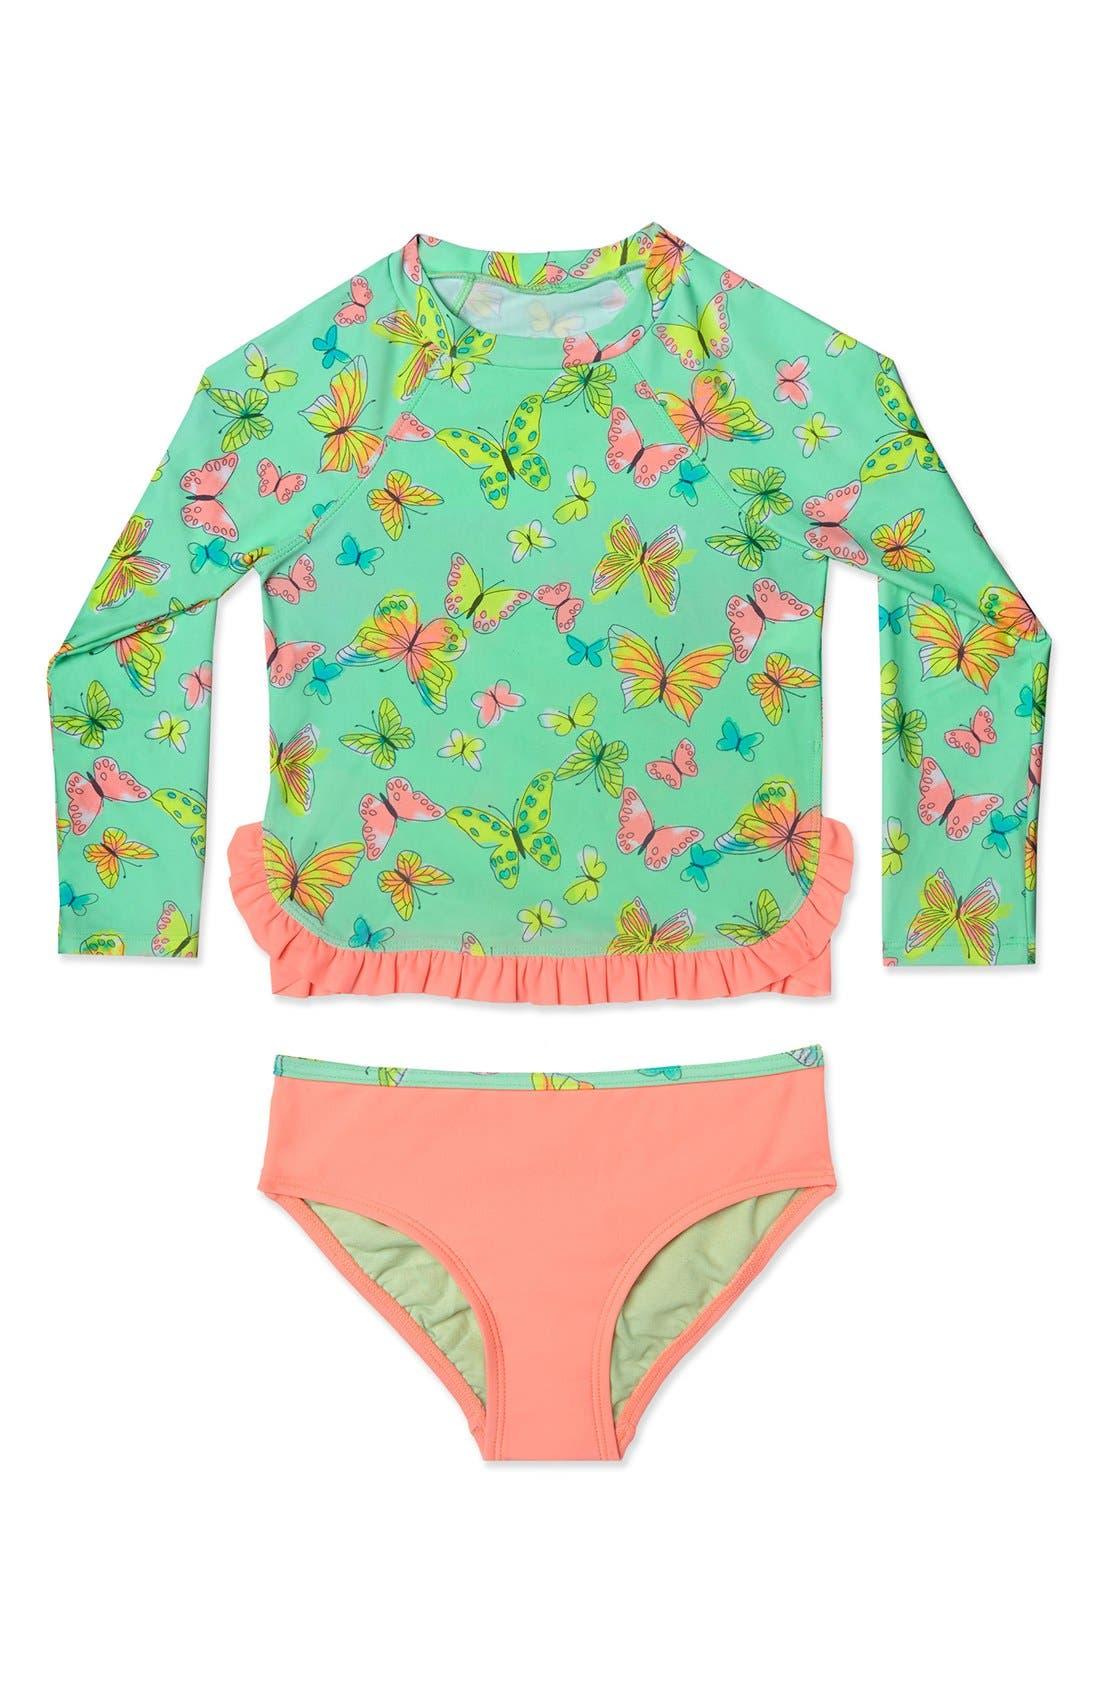 Main Image - Hula Star 'Butterfly' Two-Piece Rashguard Swimsuit (Toddler Girls & Little Girls)